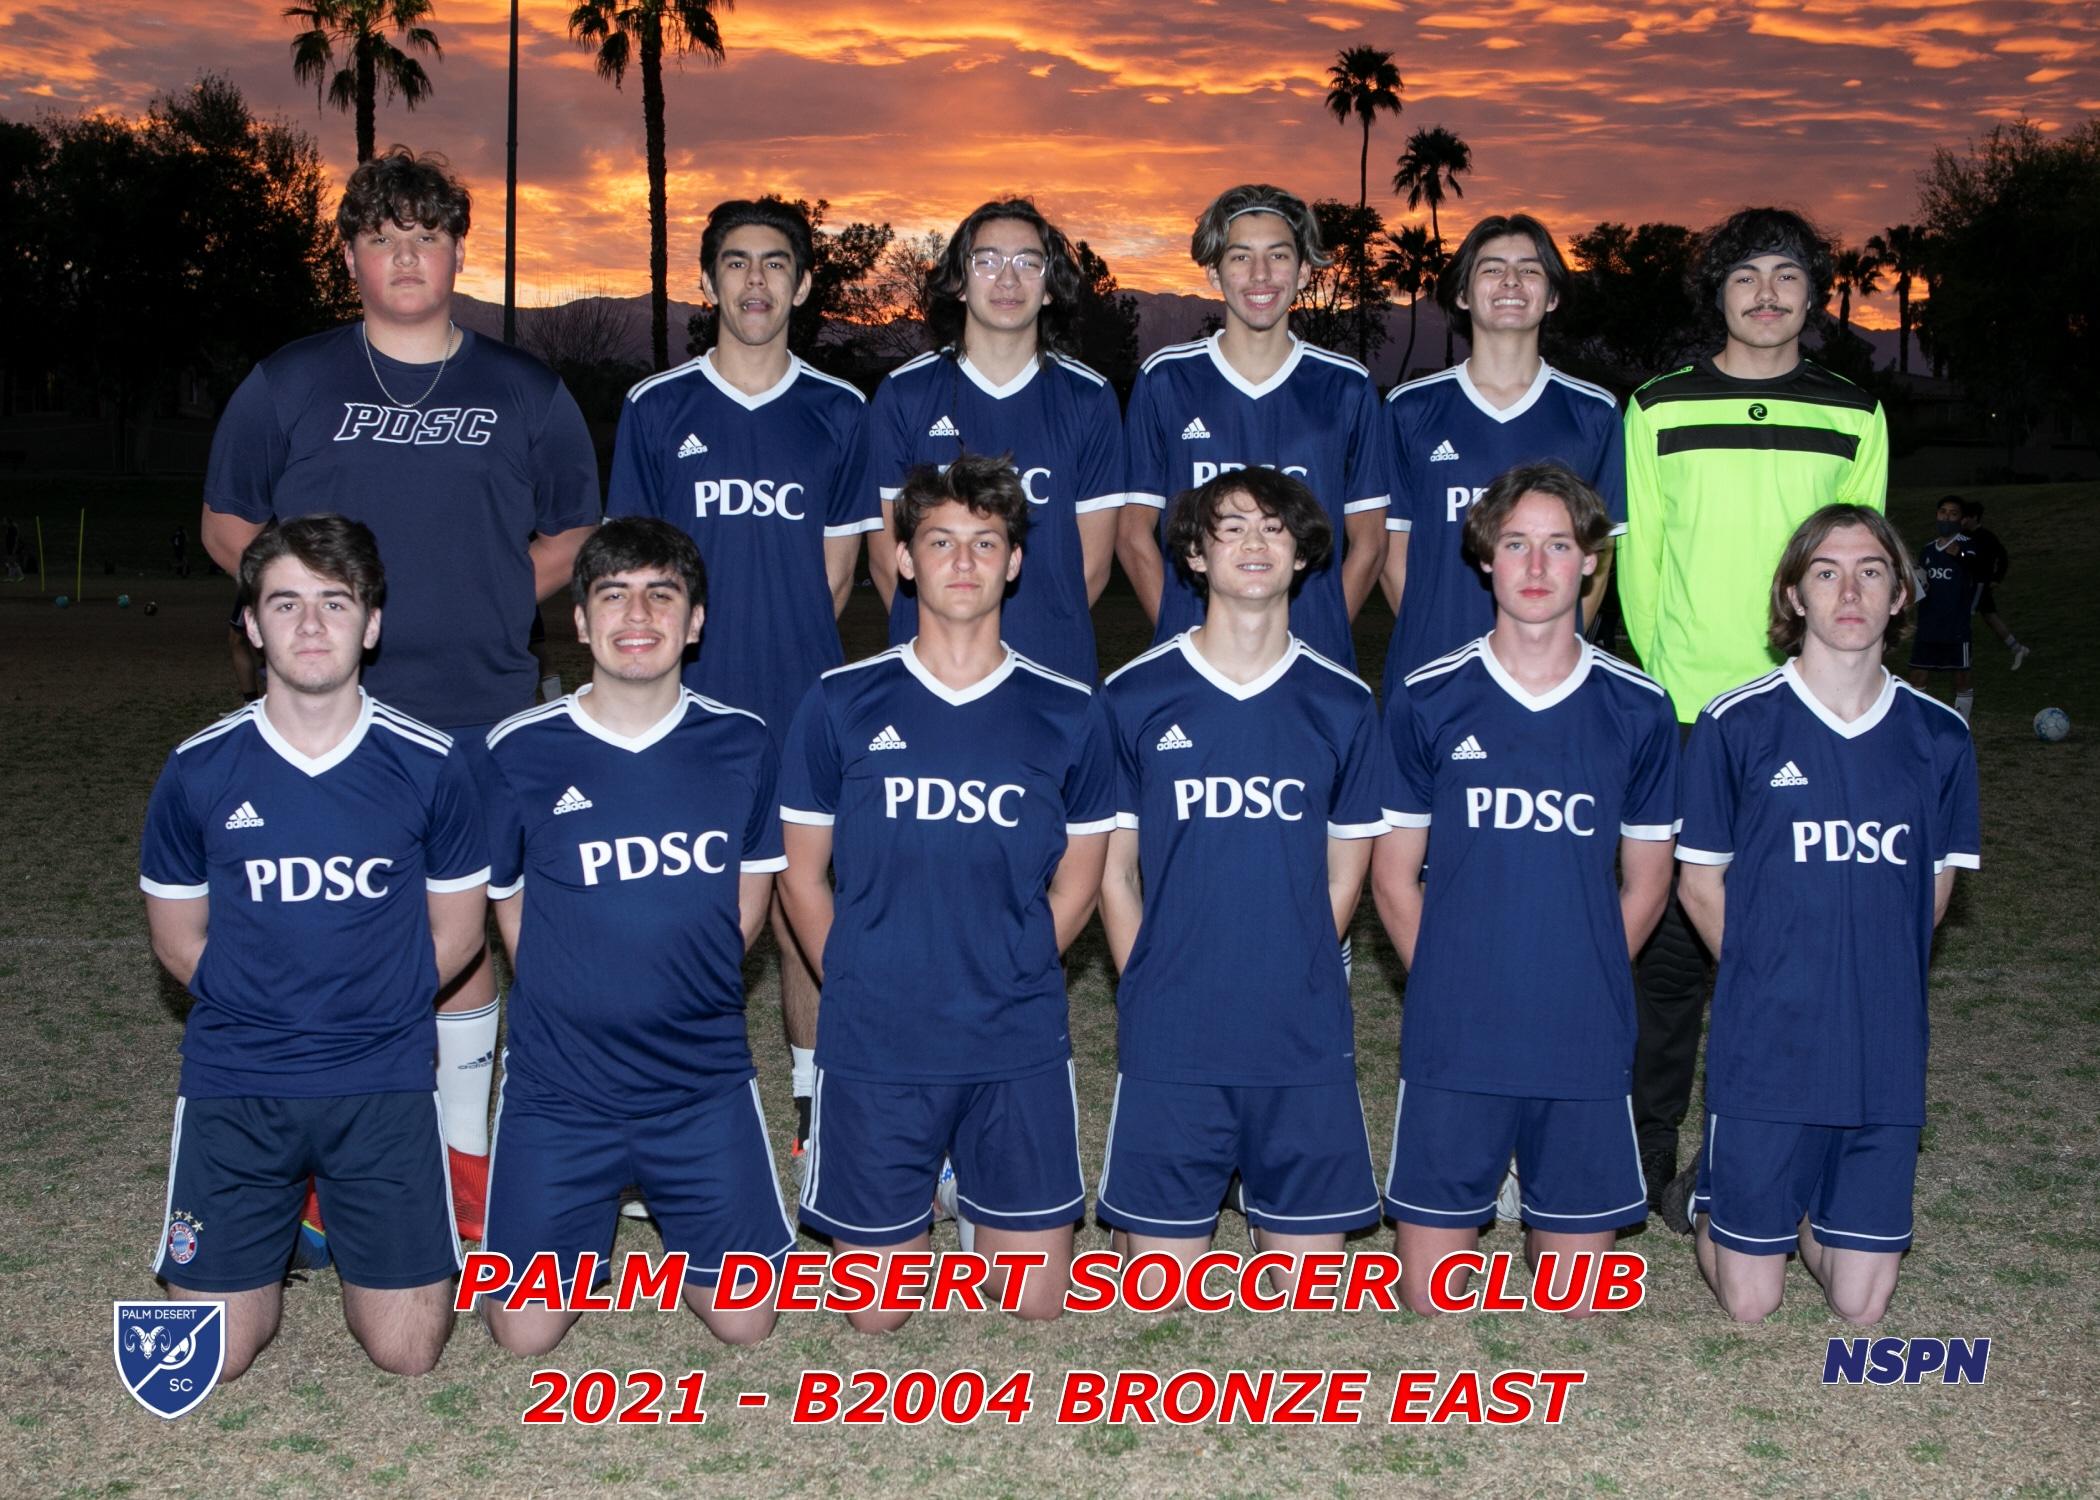 Palm Desert Soccer Club B2004 Bronze East